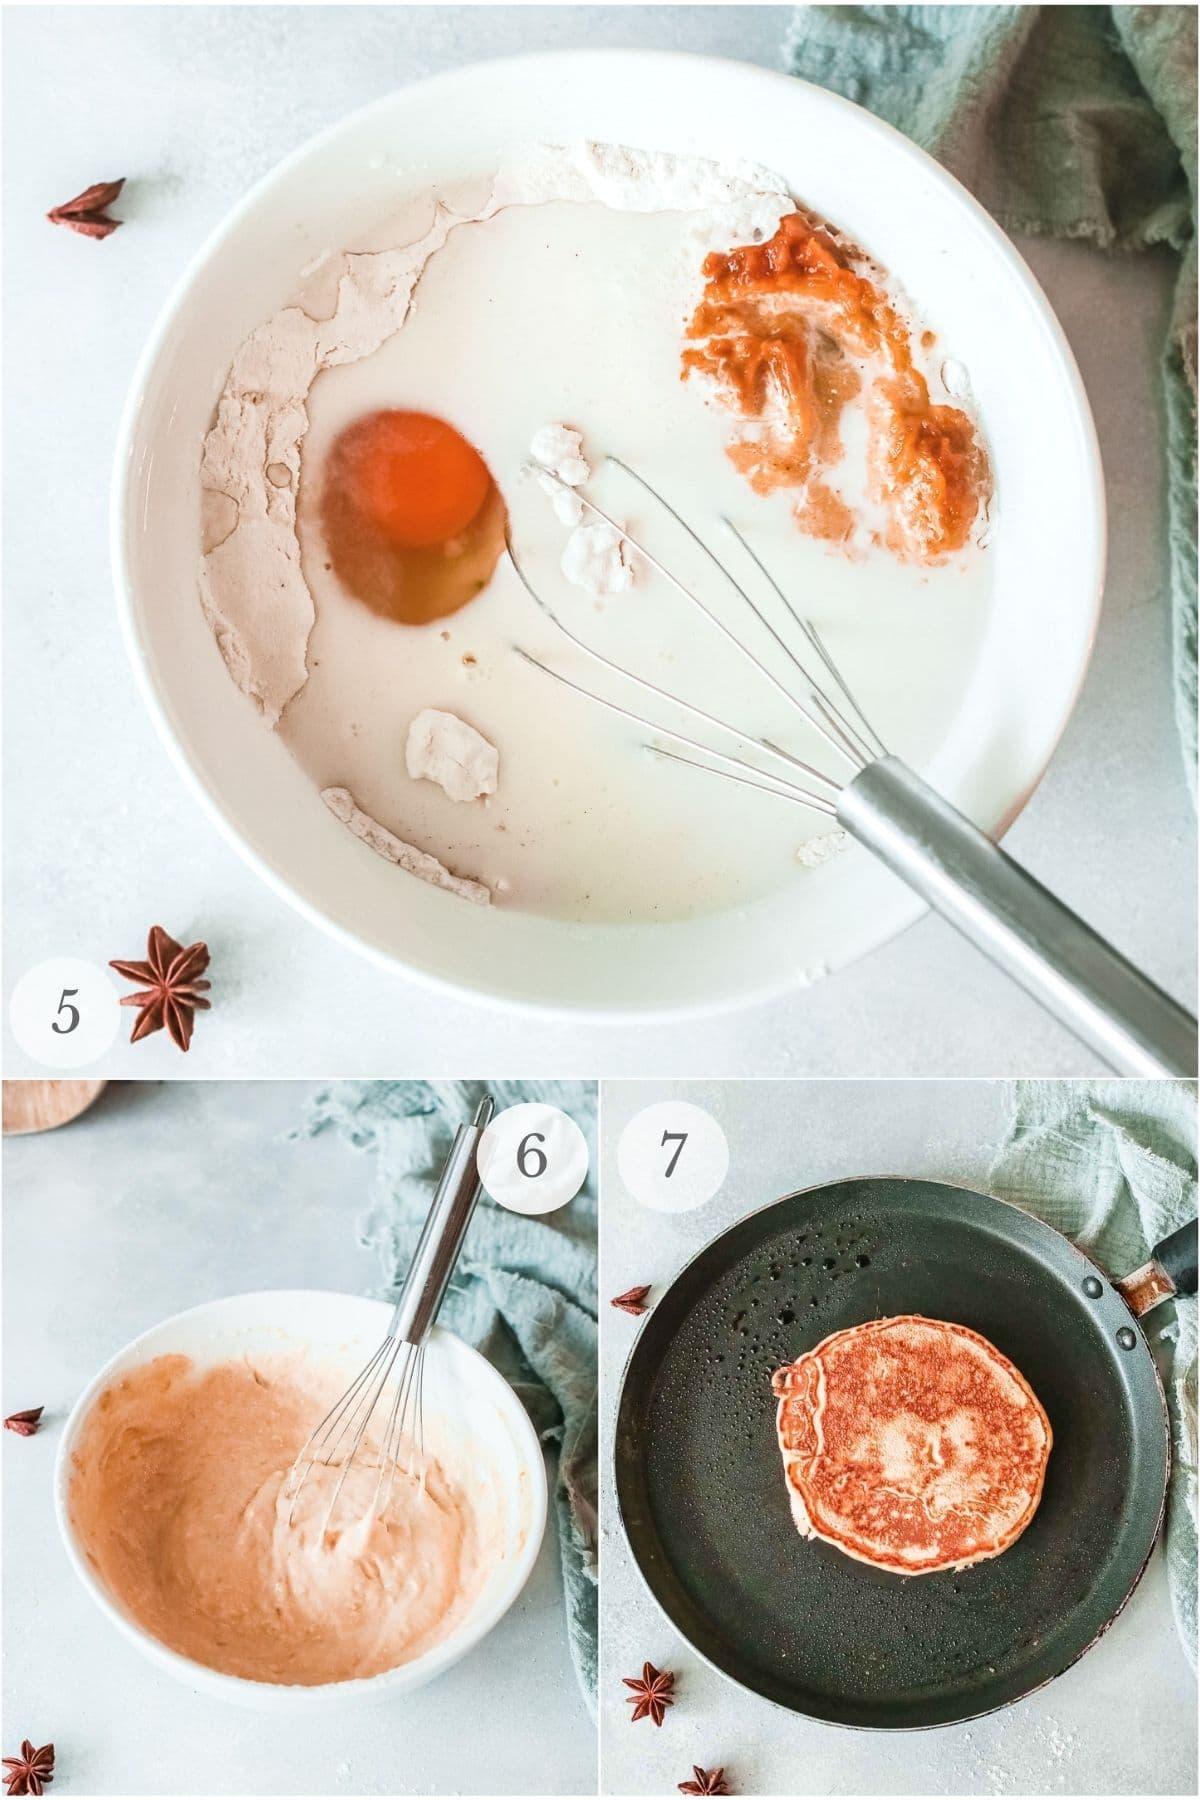 apple pancakes steps 5-7